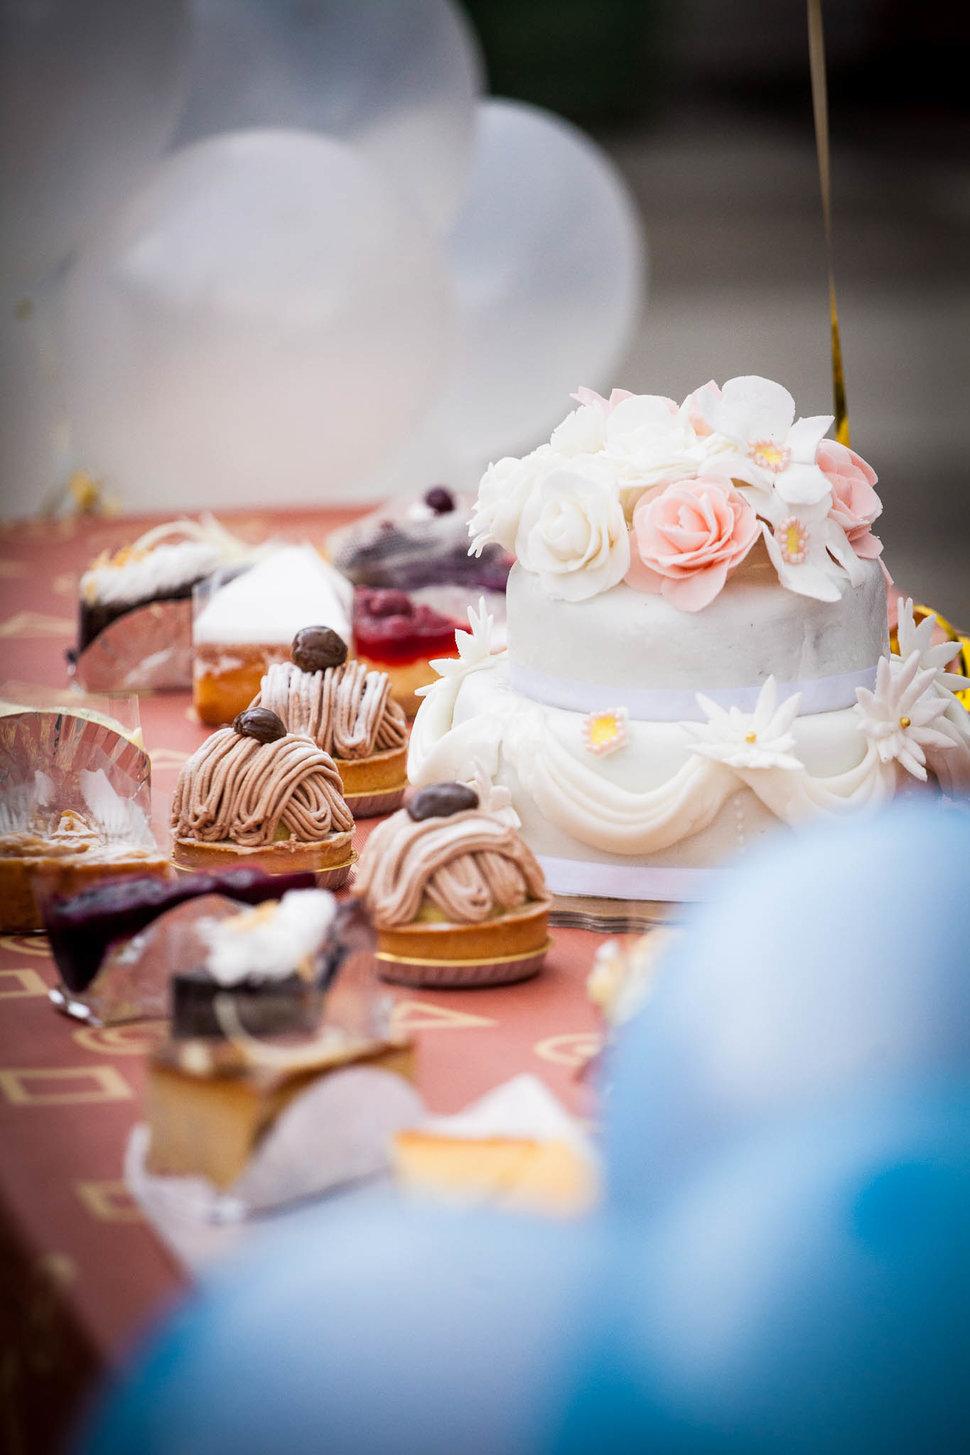 18PHOTO-大育❤️ 小汝(花園婚禮)(編號:226007) - 18PHOTO 婚紗影像攝影工作室 - 結婚吧一站式婚禮服務平台